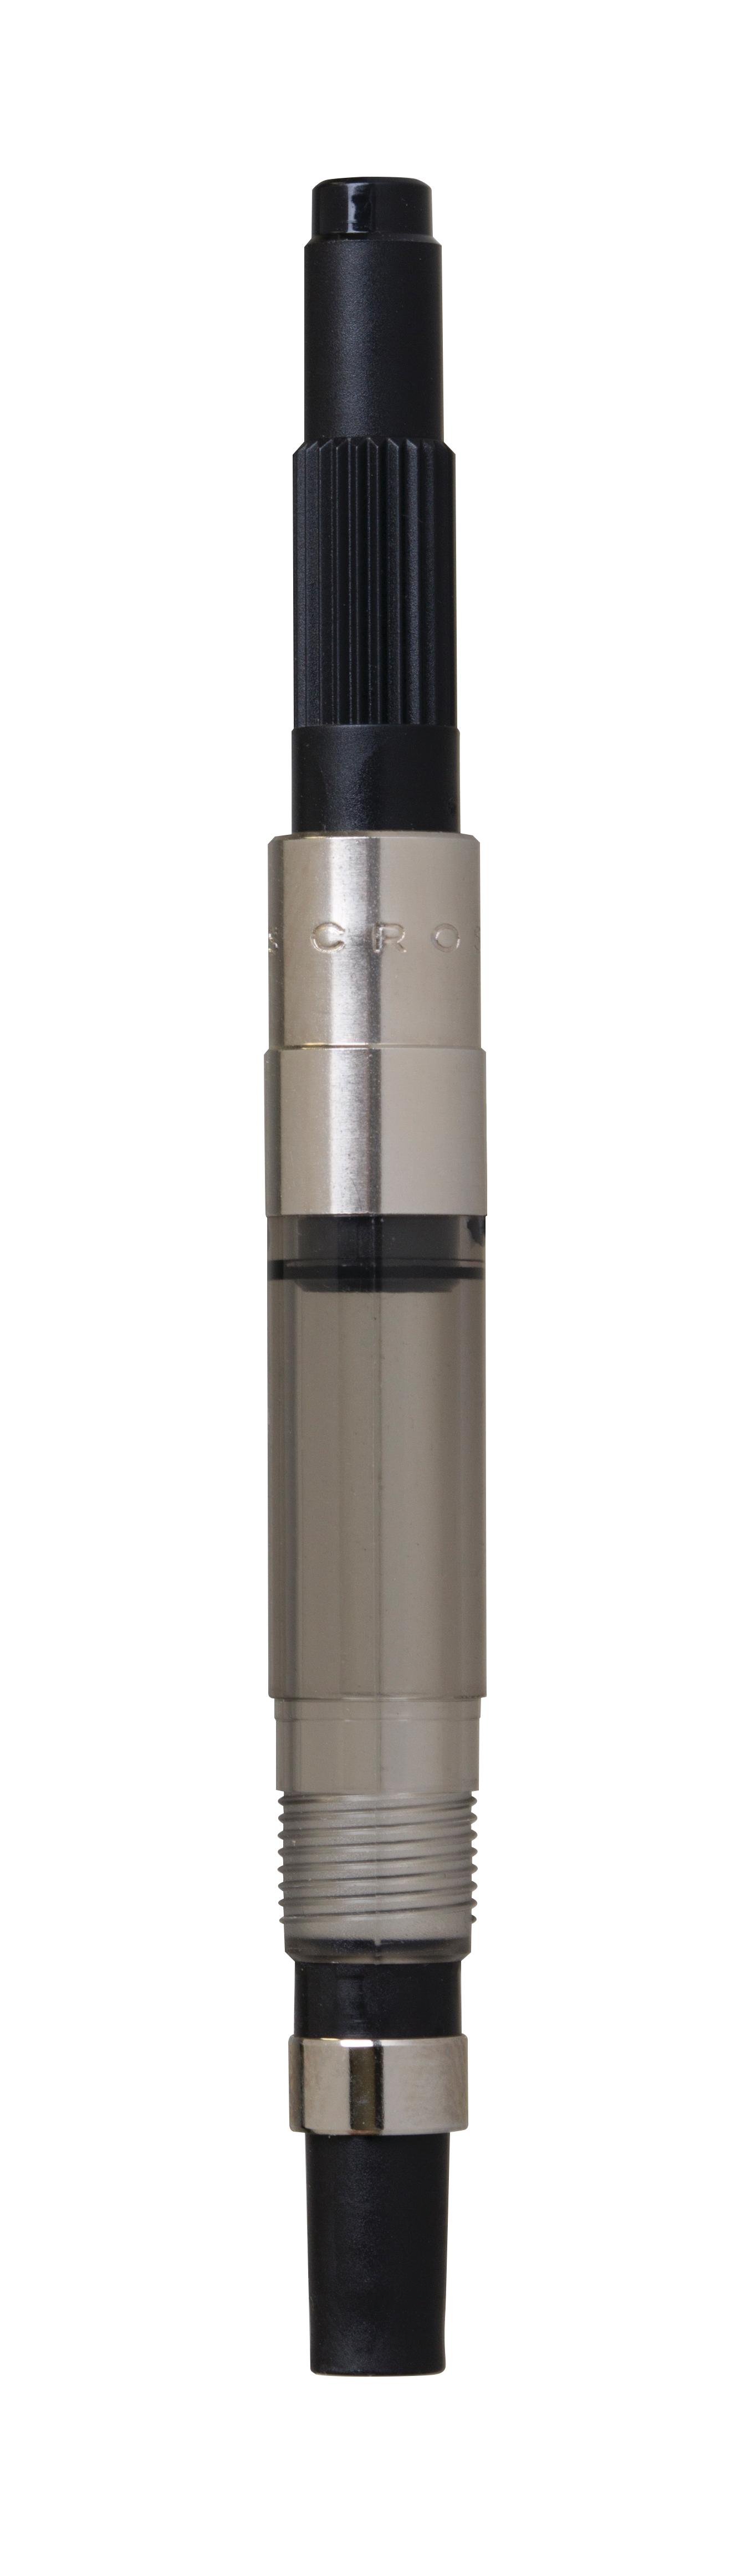 Fountain Pen Converter Screw-in Style